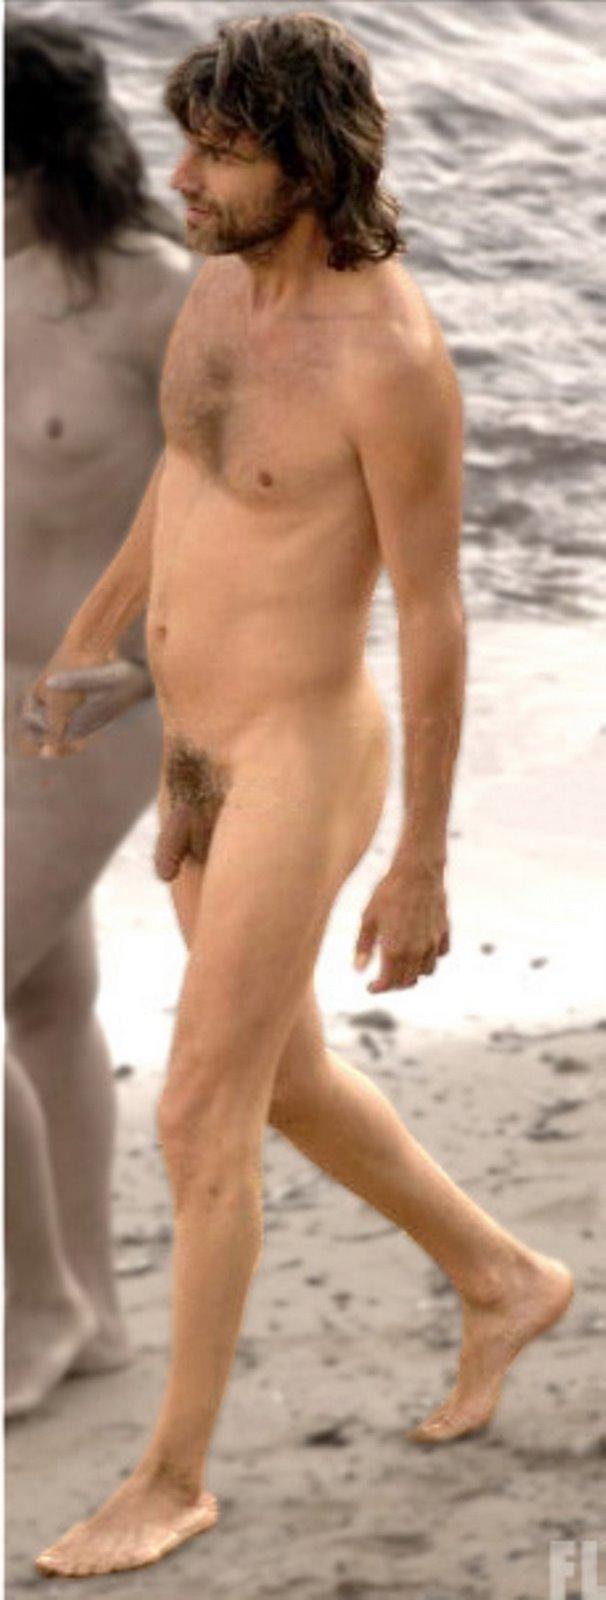 nude king island tasmania sexy porn